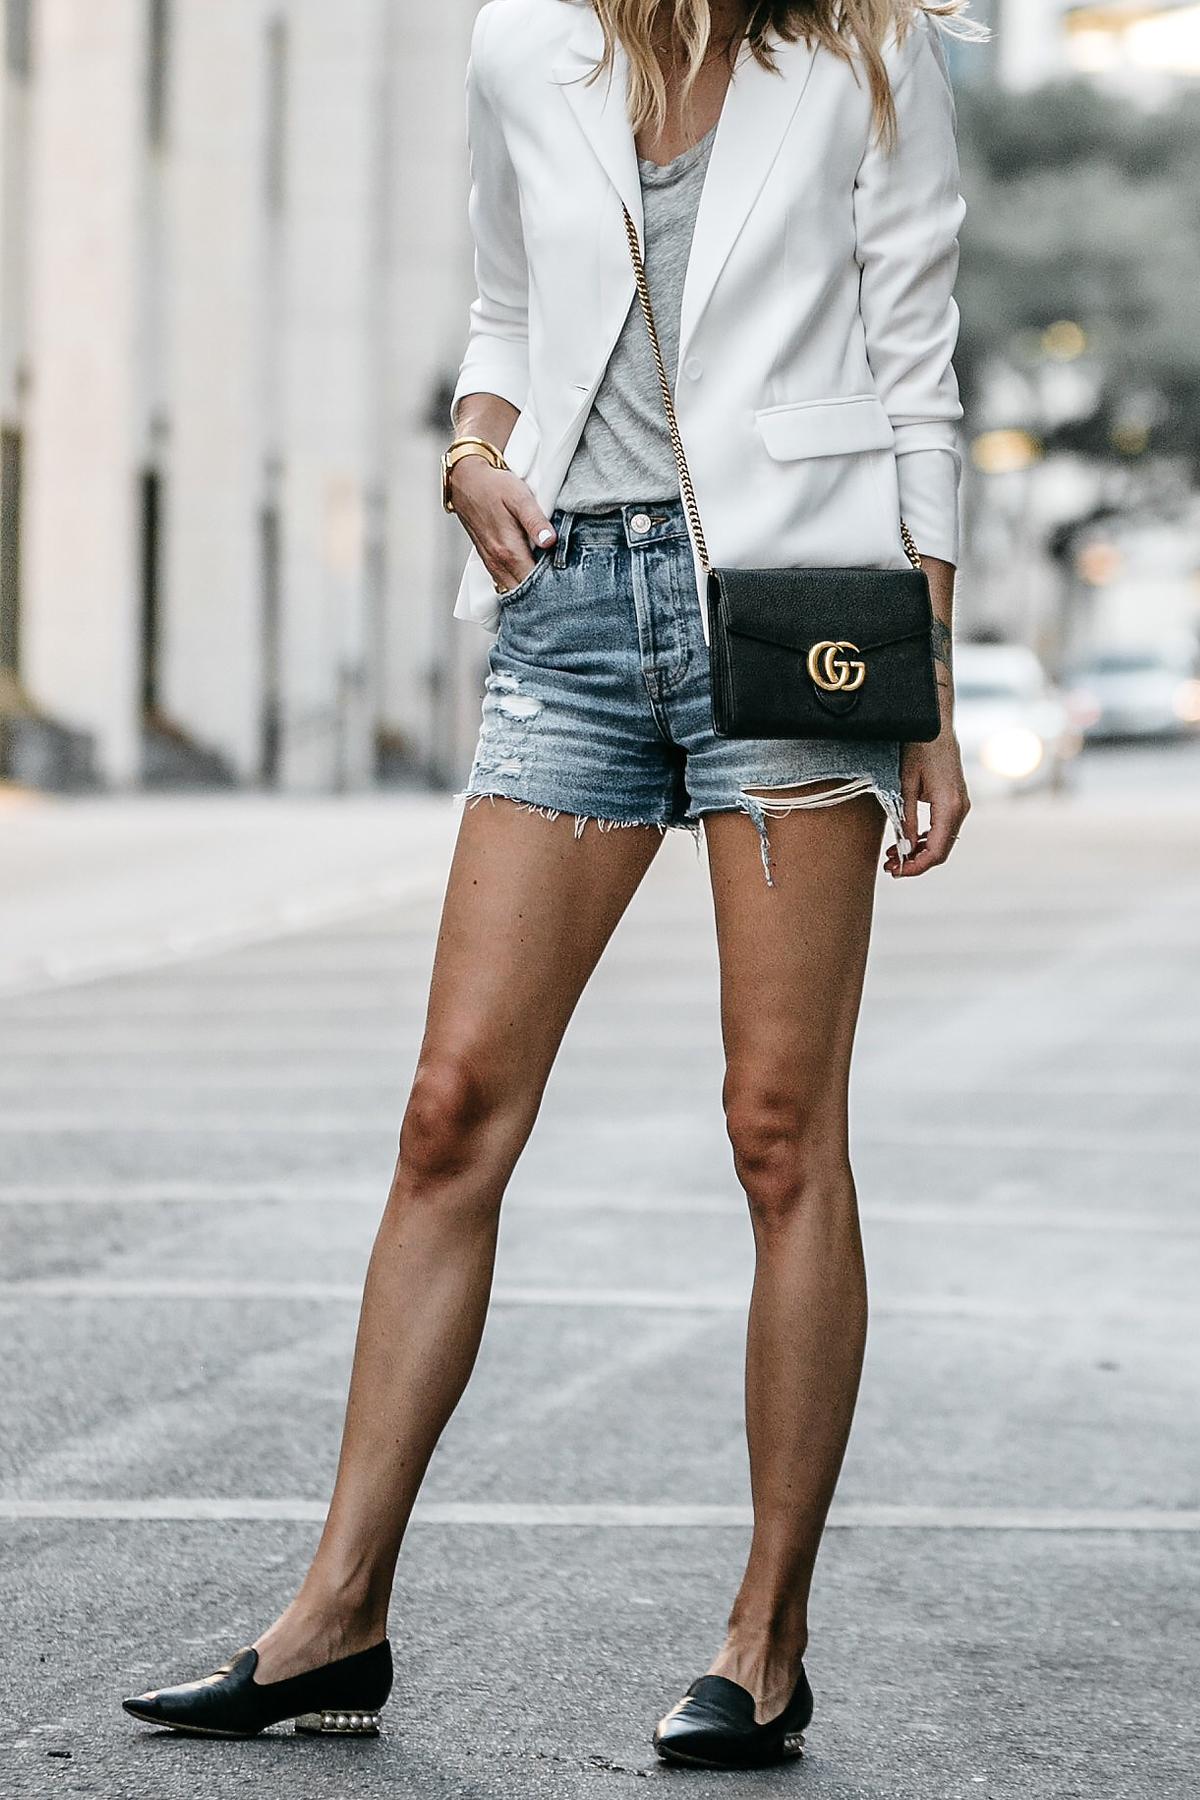 Nordstrom White Blazer Everlane Grey Tshirt Topshop Ripped Denim Shorts Outfit Gucci Marmont Handbag Black Loafers Fashion Jackson Dallas Blogger Fashion Blogger Street Style